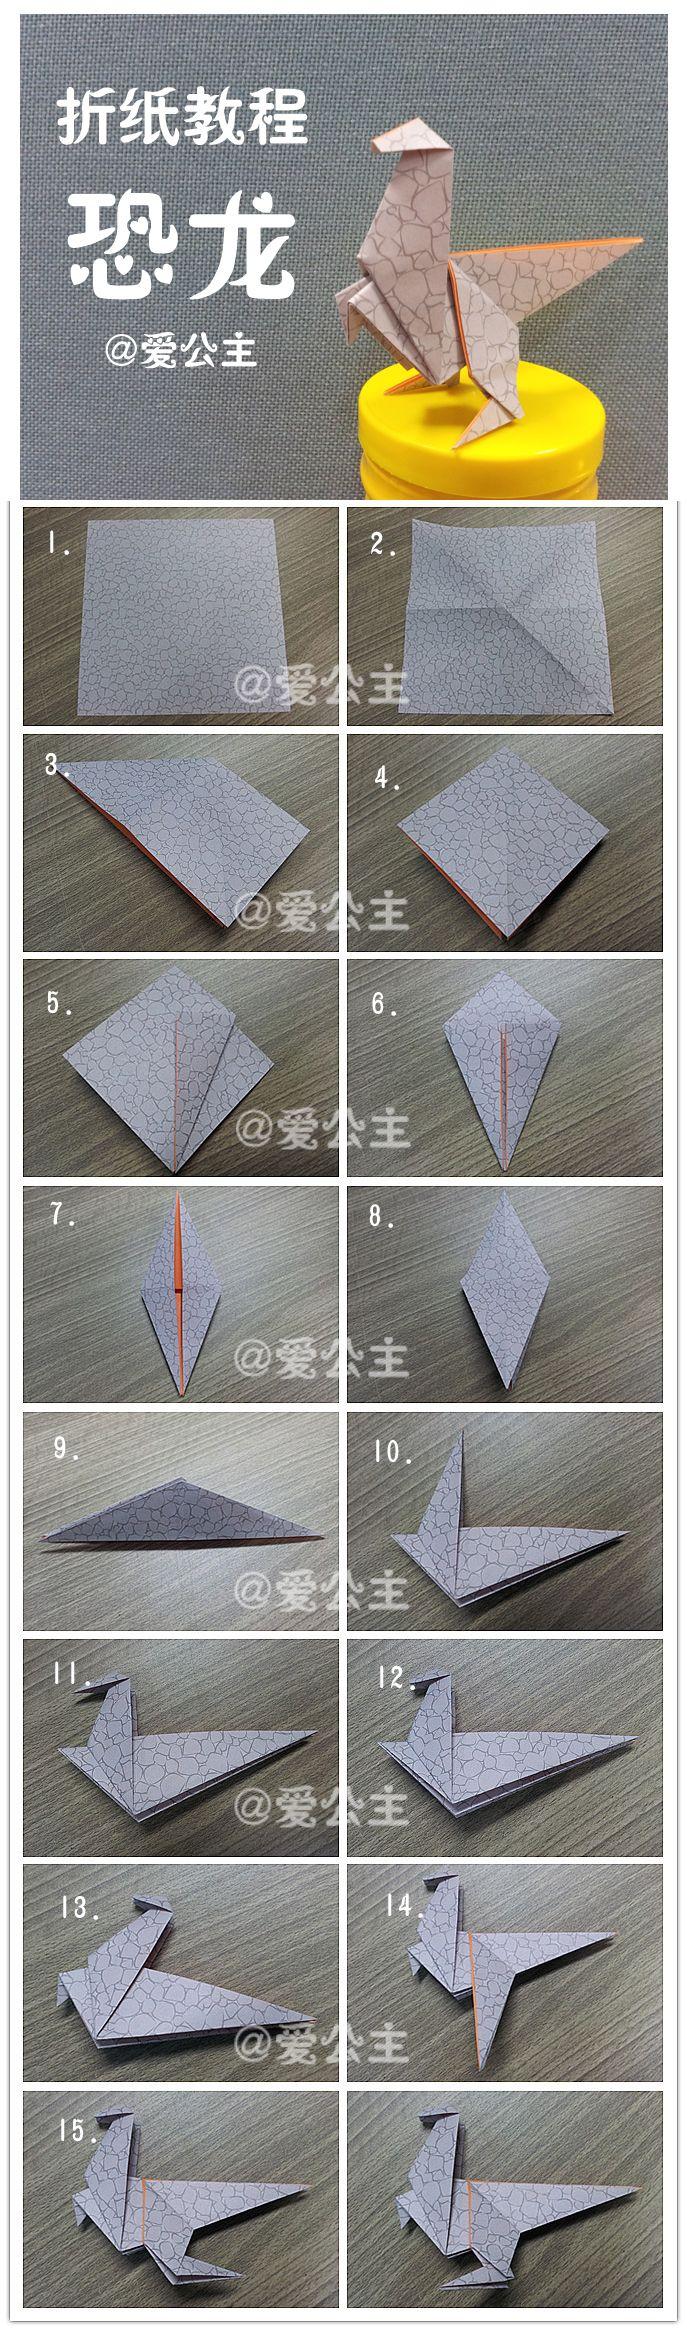 tuto pliage dinosaure en papier origami  https://www.youtube.com/watch?v=VUfaKEYchgg